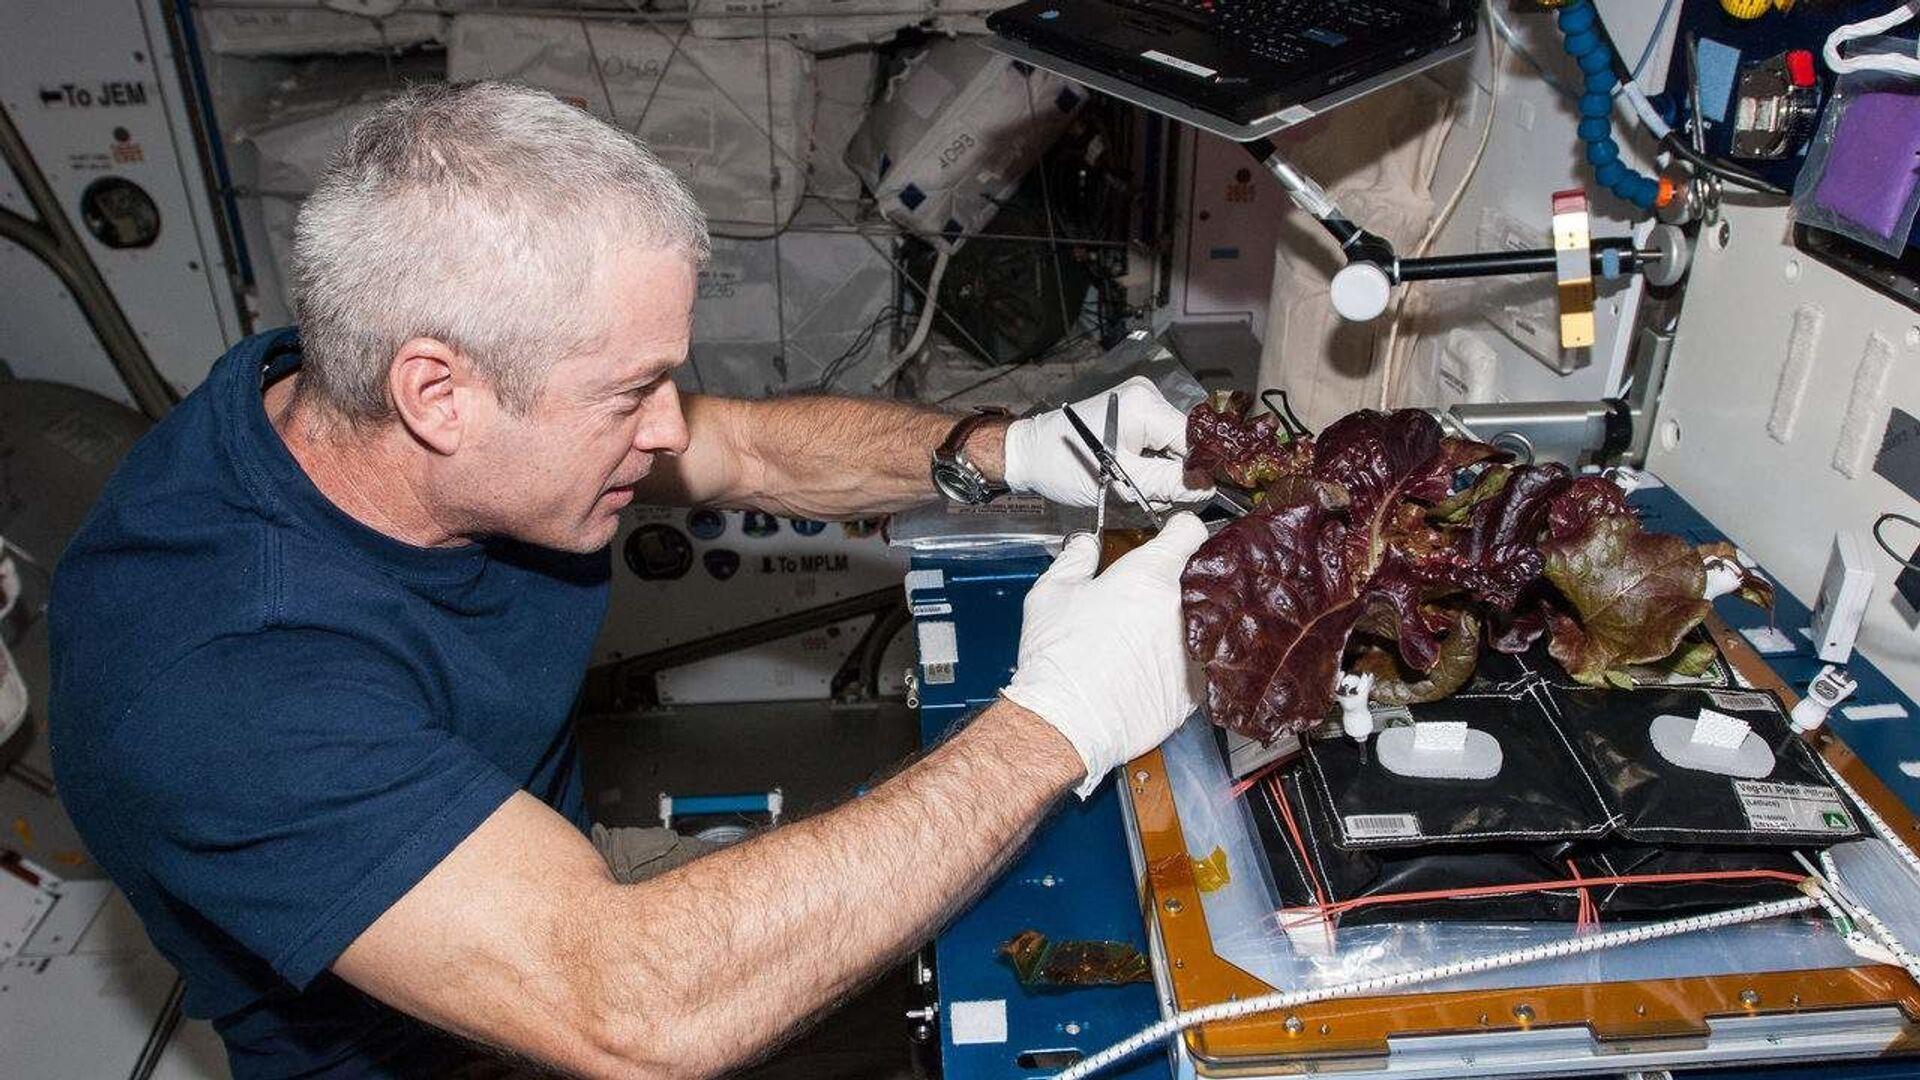 Американский астронавт Стивен Суонсон собирает выращенный на МКС салат  - Sputnik Italia, 1920, 22.06.2021